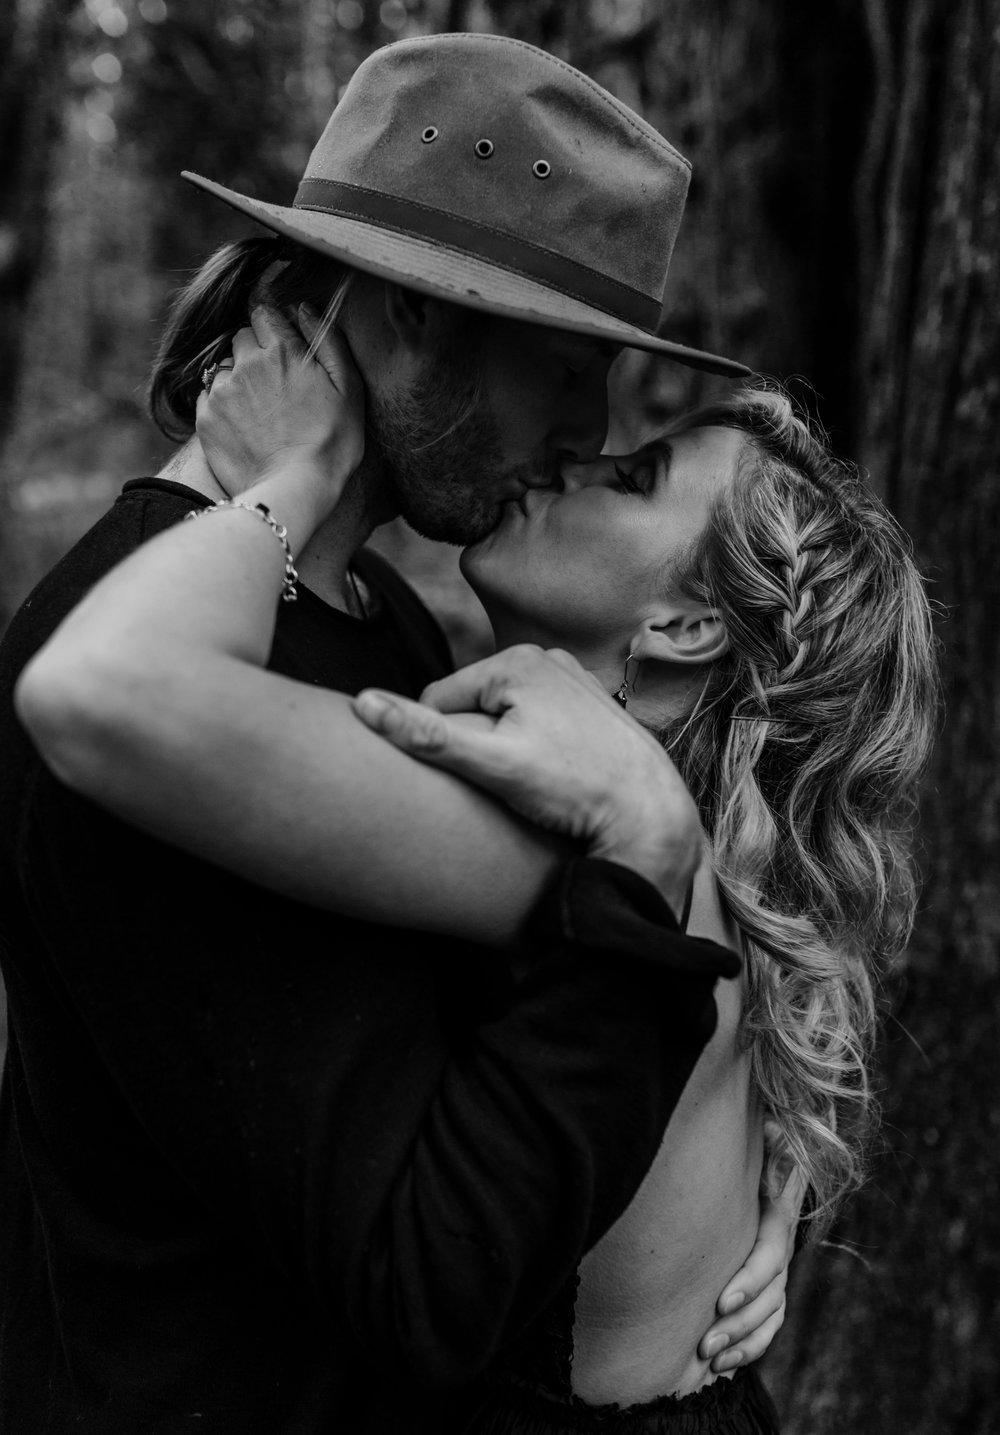 Squamish Wedding Photographer - Squamish Engagement Photos -  Vancouver Wedding Photographer & Videographer - Sunshine Coast Wedding Photos - Sunshine Coast Wedding Photographer - Jennifer Picard Photography - 1A5A3145.jpg